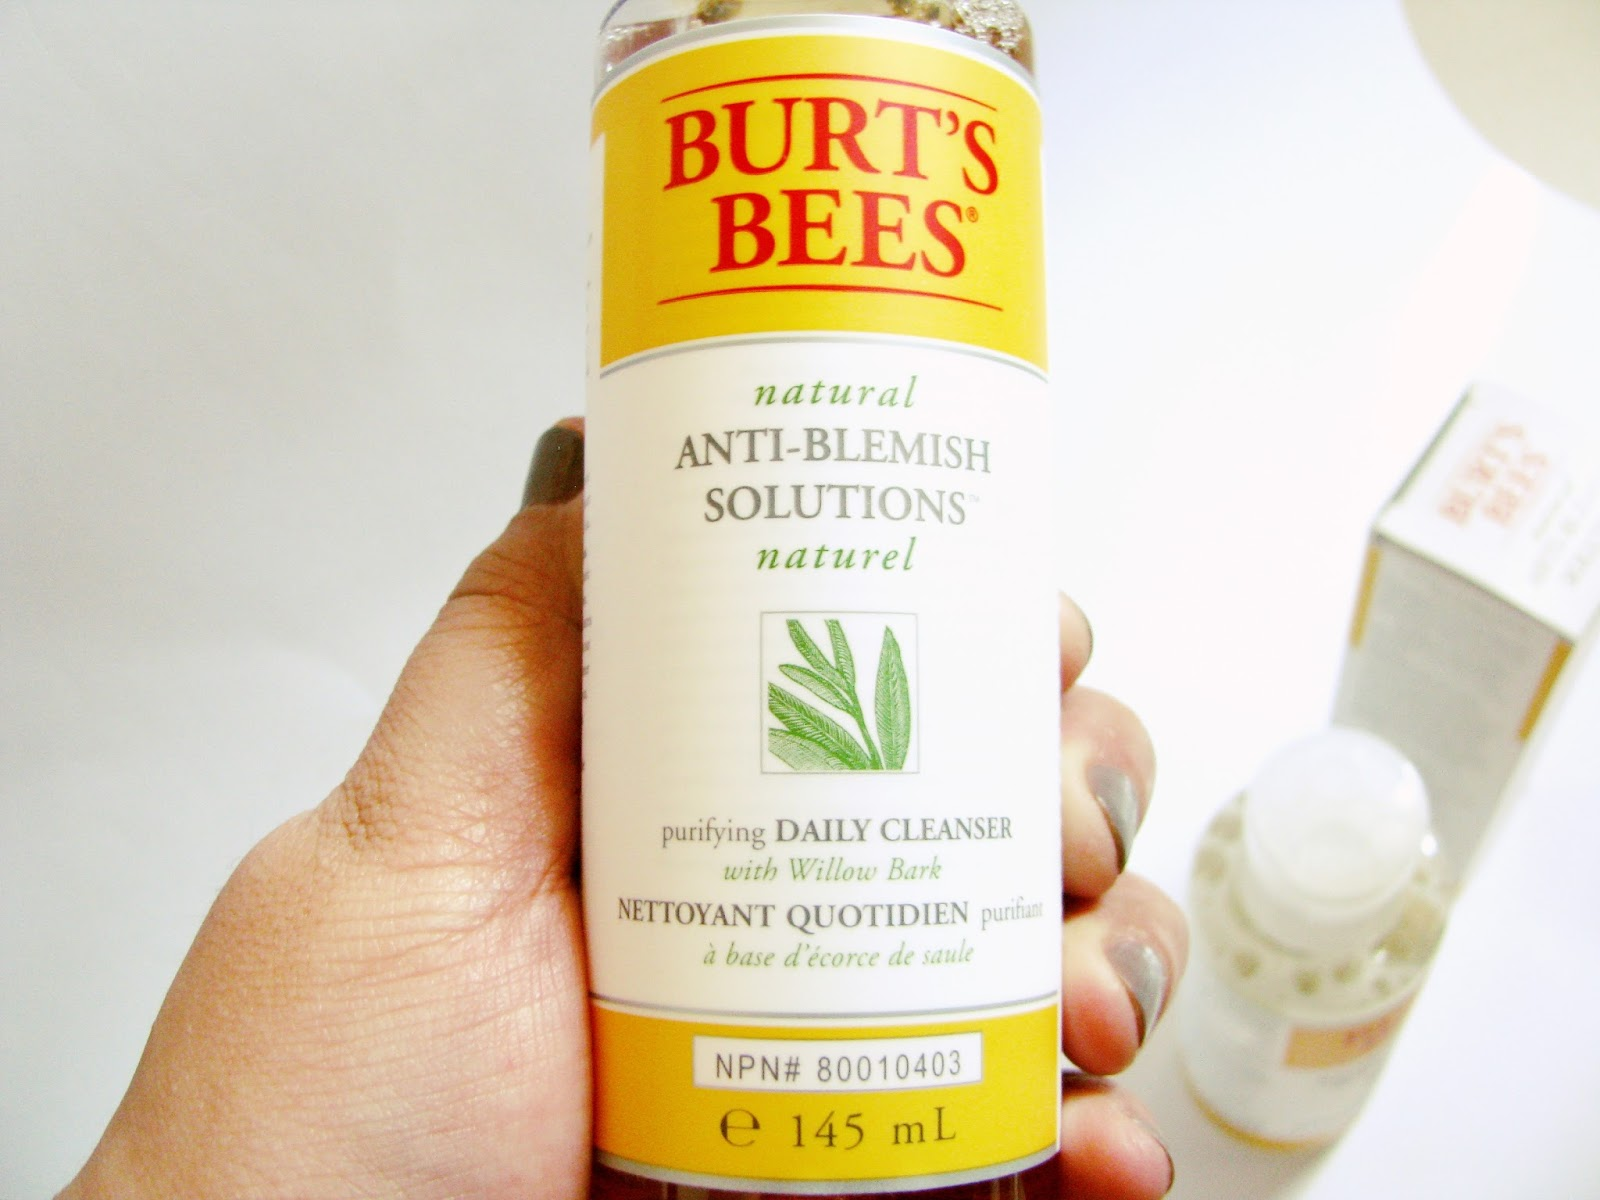 http://www.lightsandlatte.com/2016/04/burts-bees-natural-anti-blemish.html